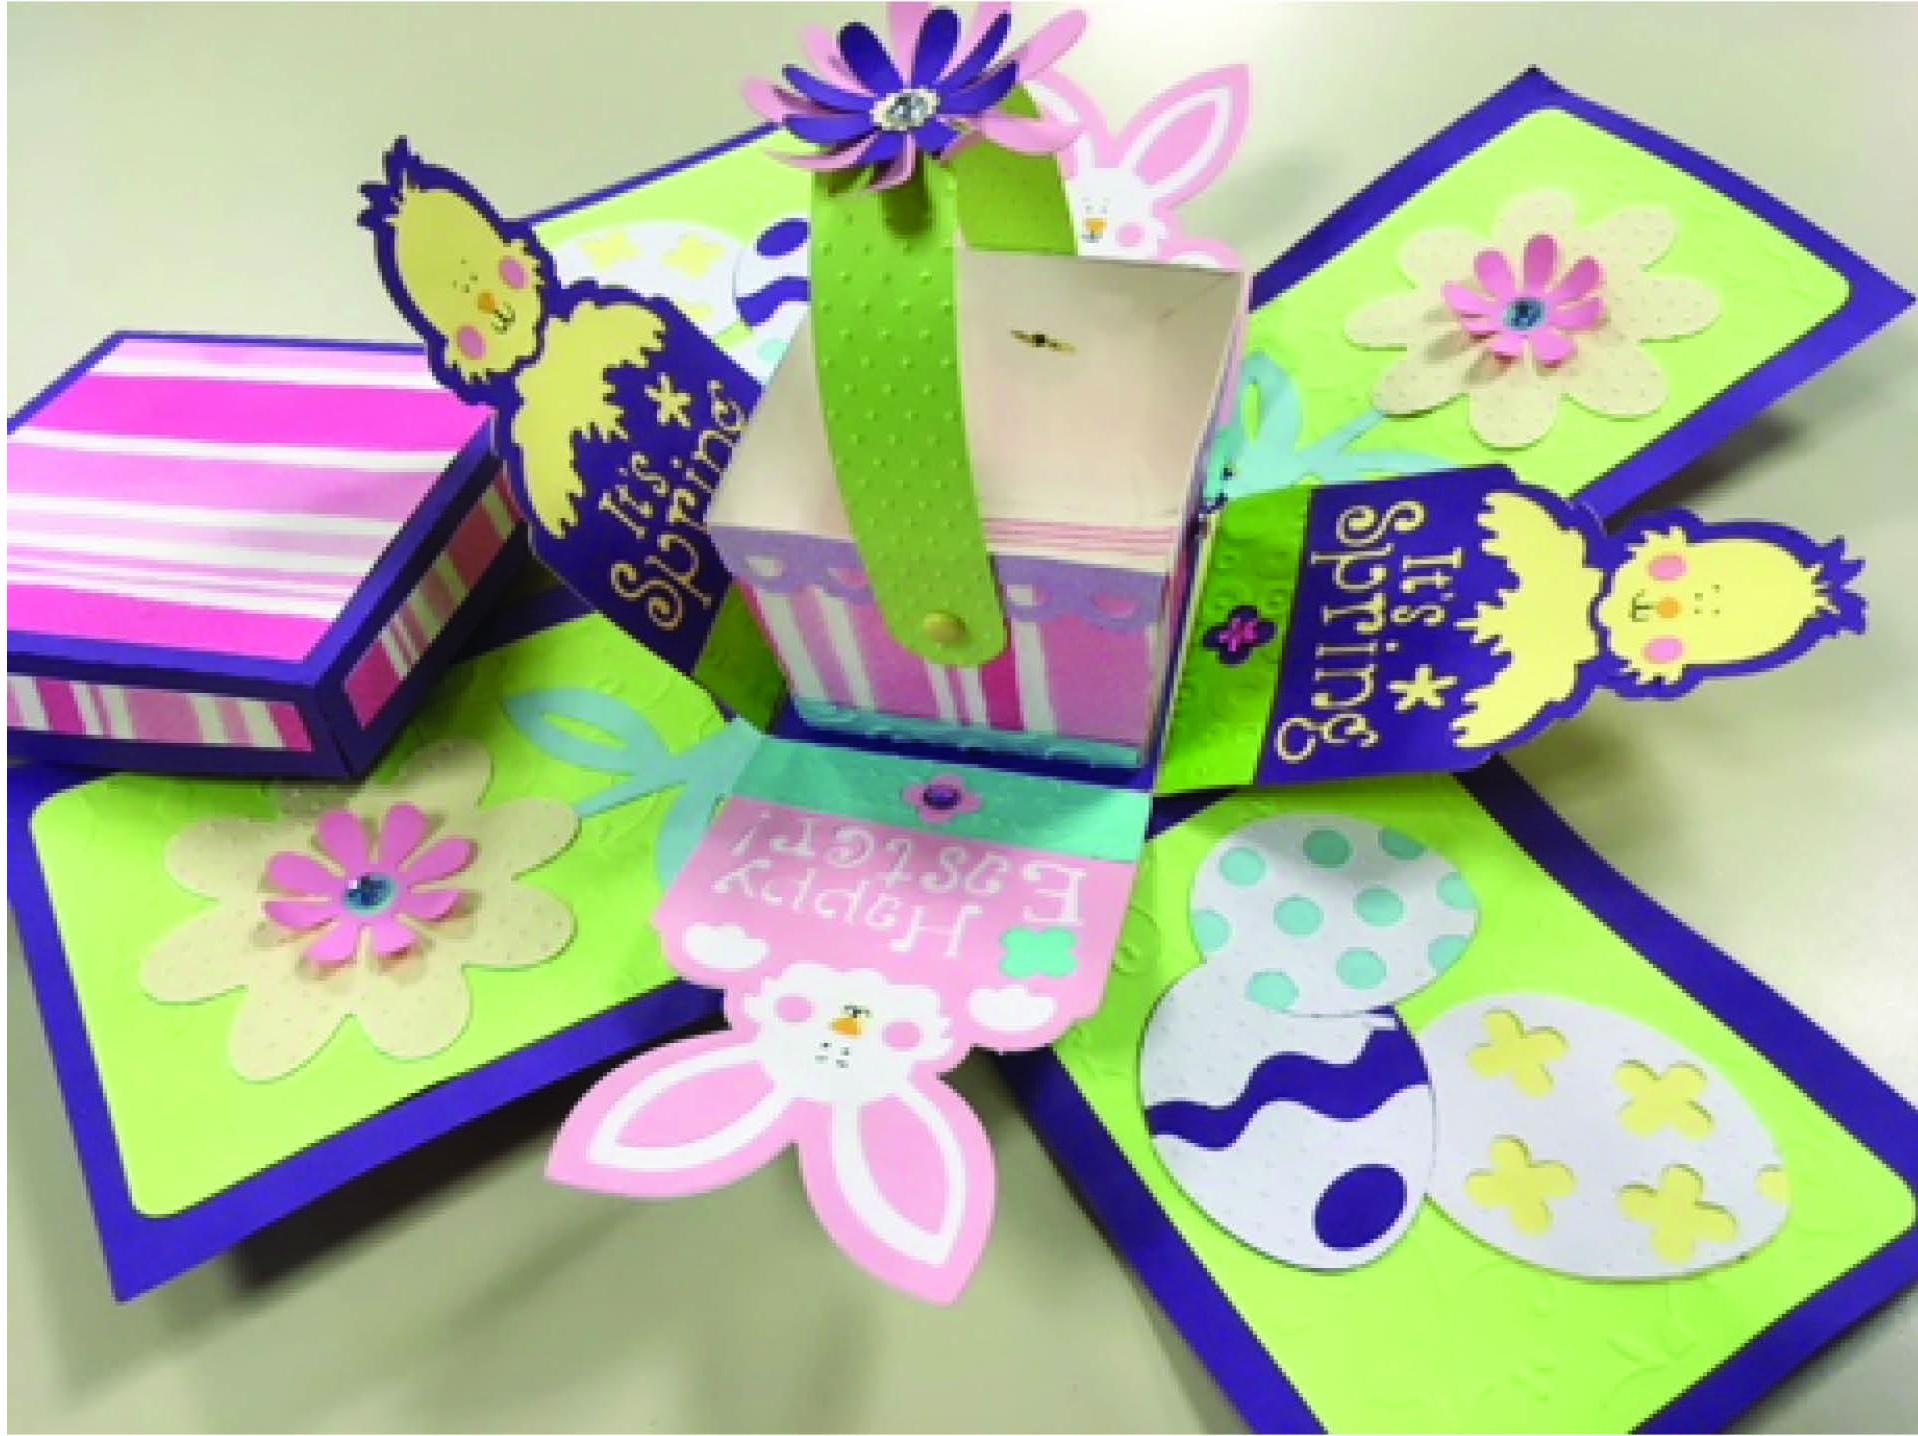 Cricut Spring/Easter Box Surprise